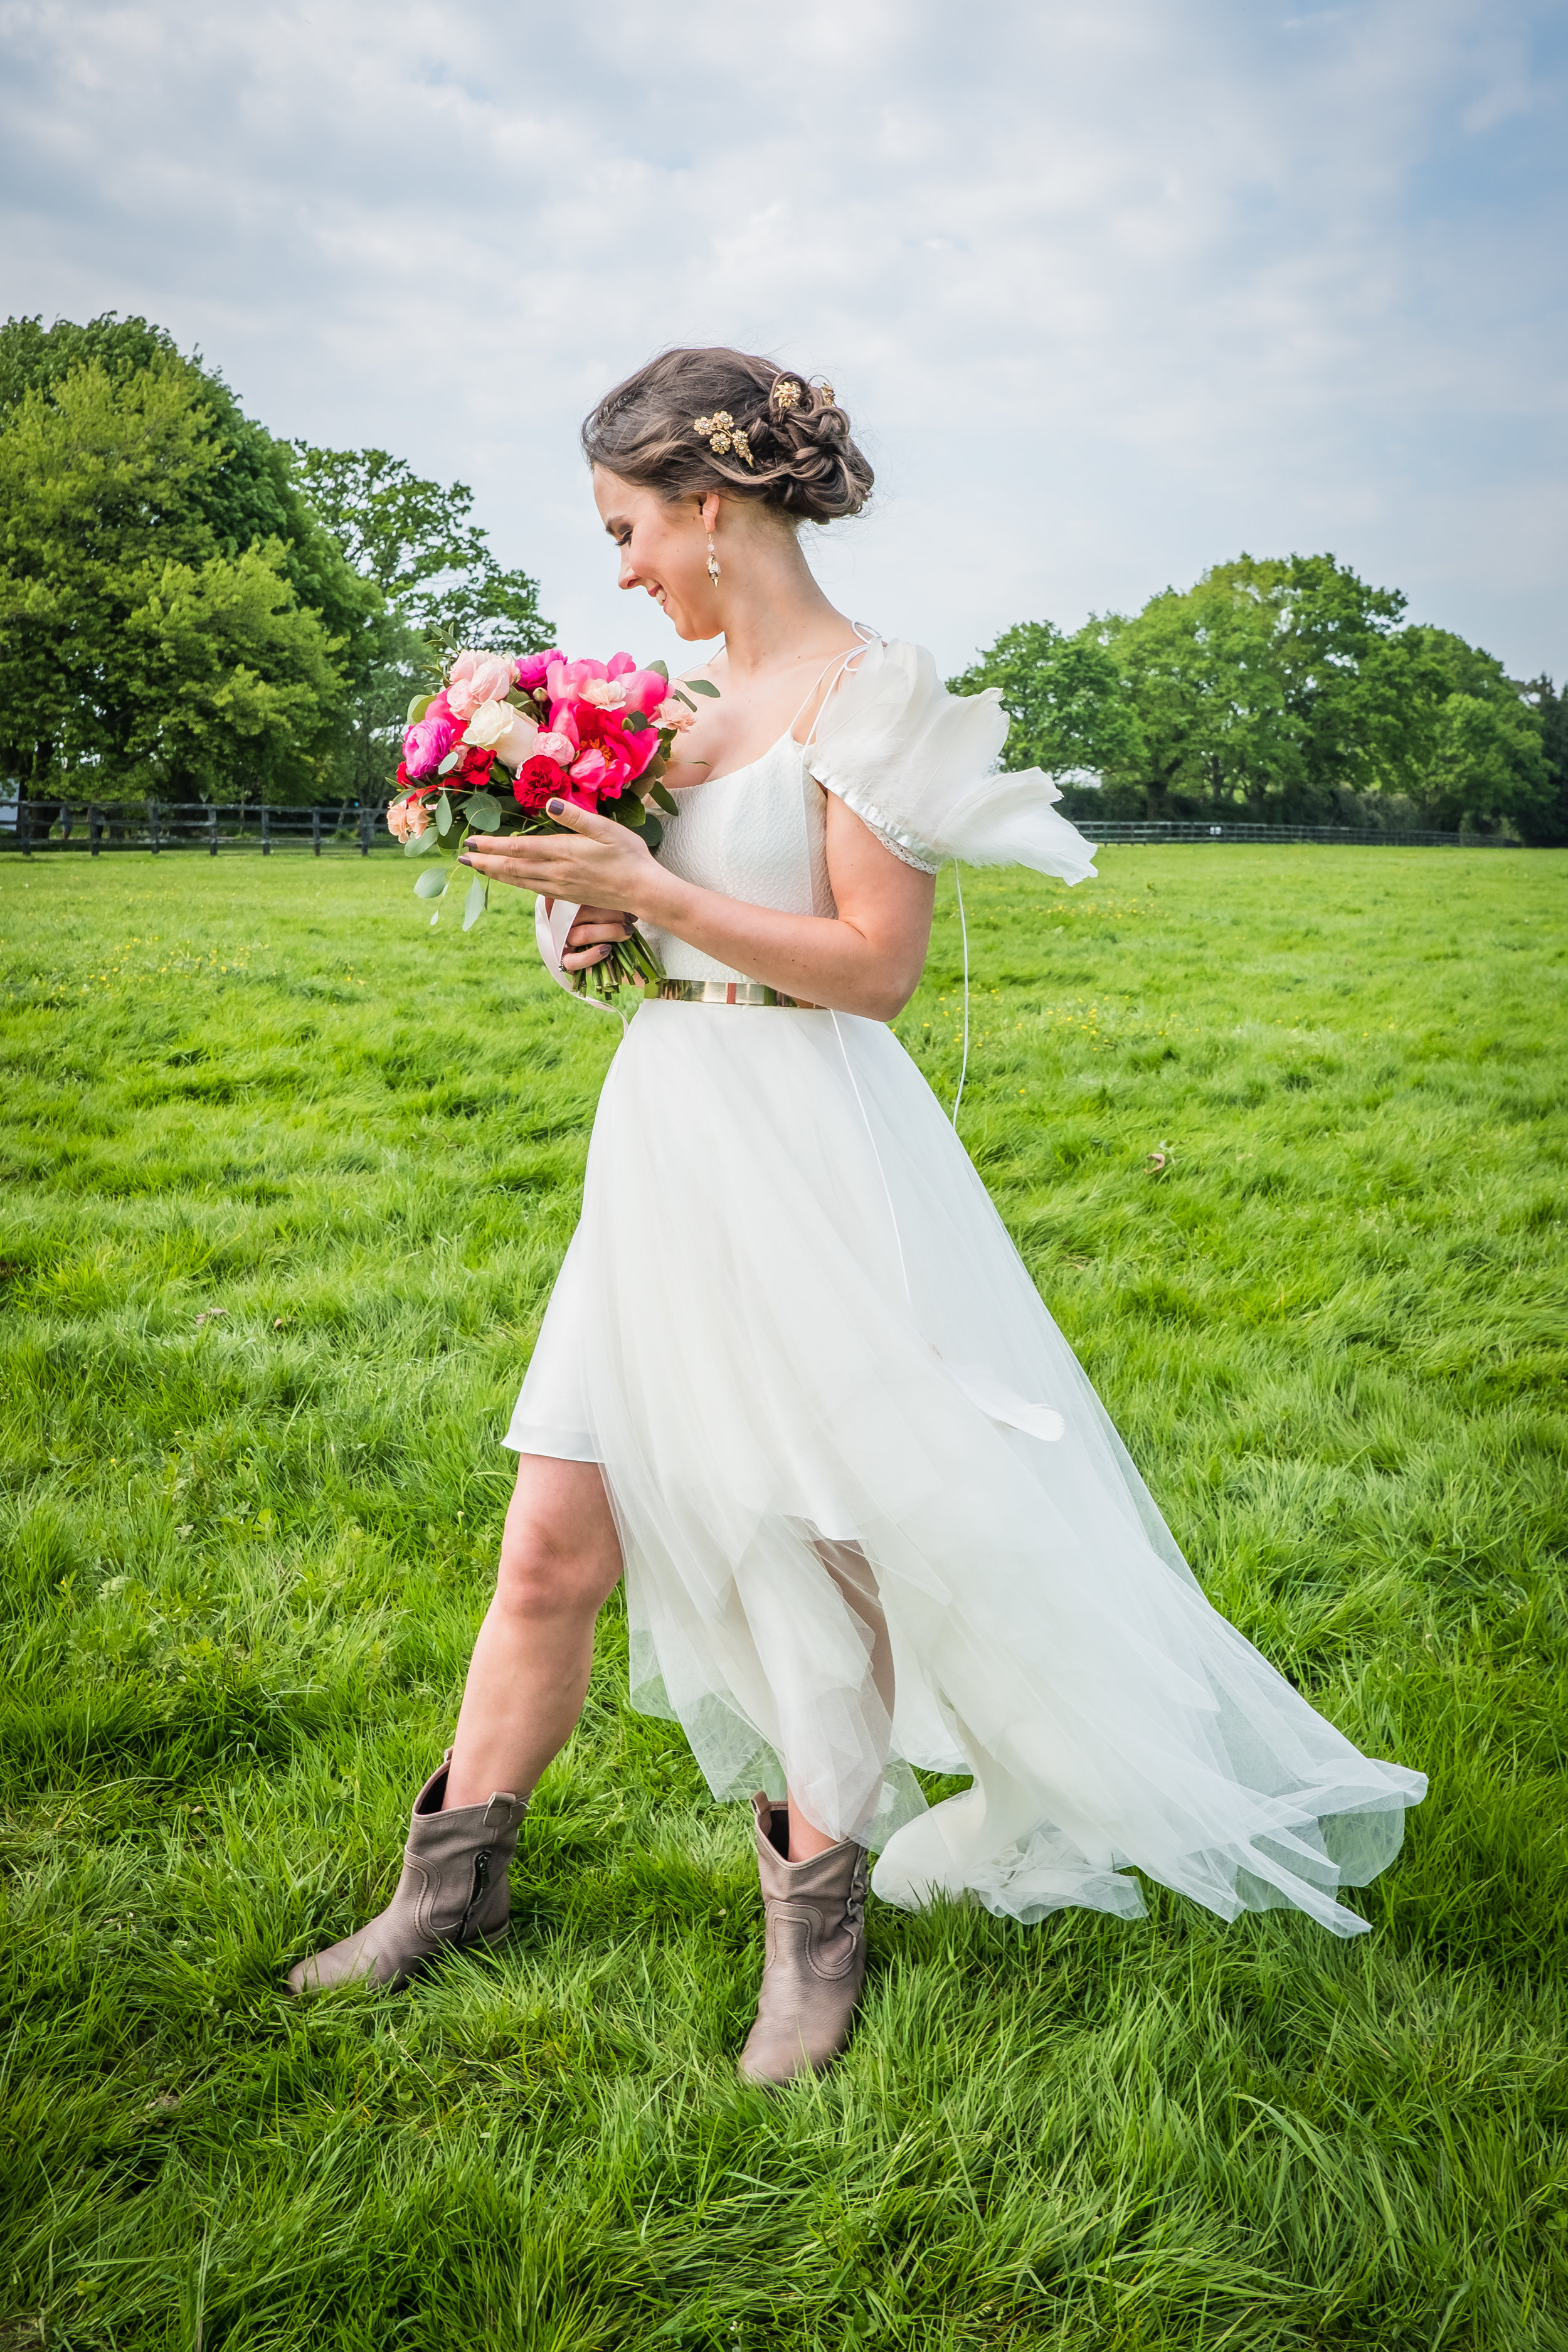 Lesley Burdett Photography ,  Frey de Paoli  make up,  Gemma Louise Bridal  hairstyling,  Nortier Shallow  dress,  Catriona  Model,  Fiesta Fields  Venue,  Emma Shoe  Bride Styling